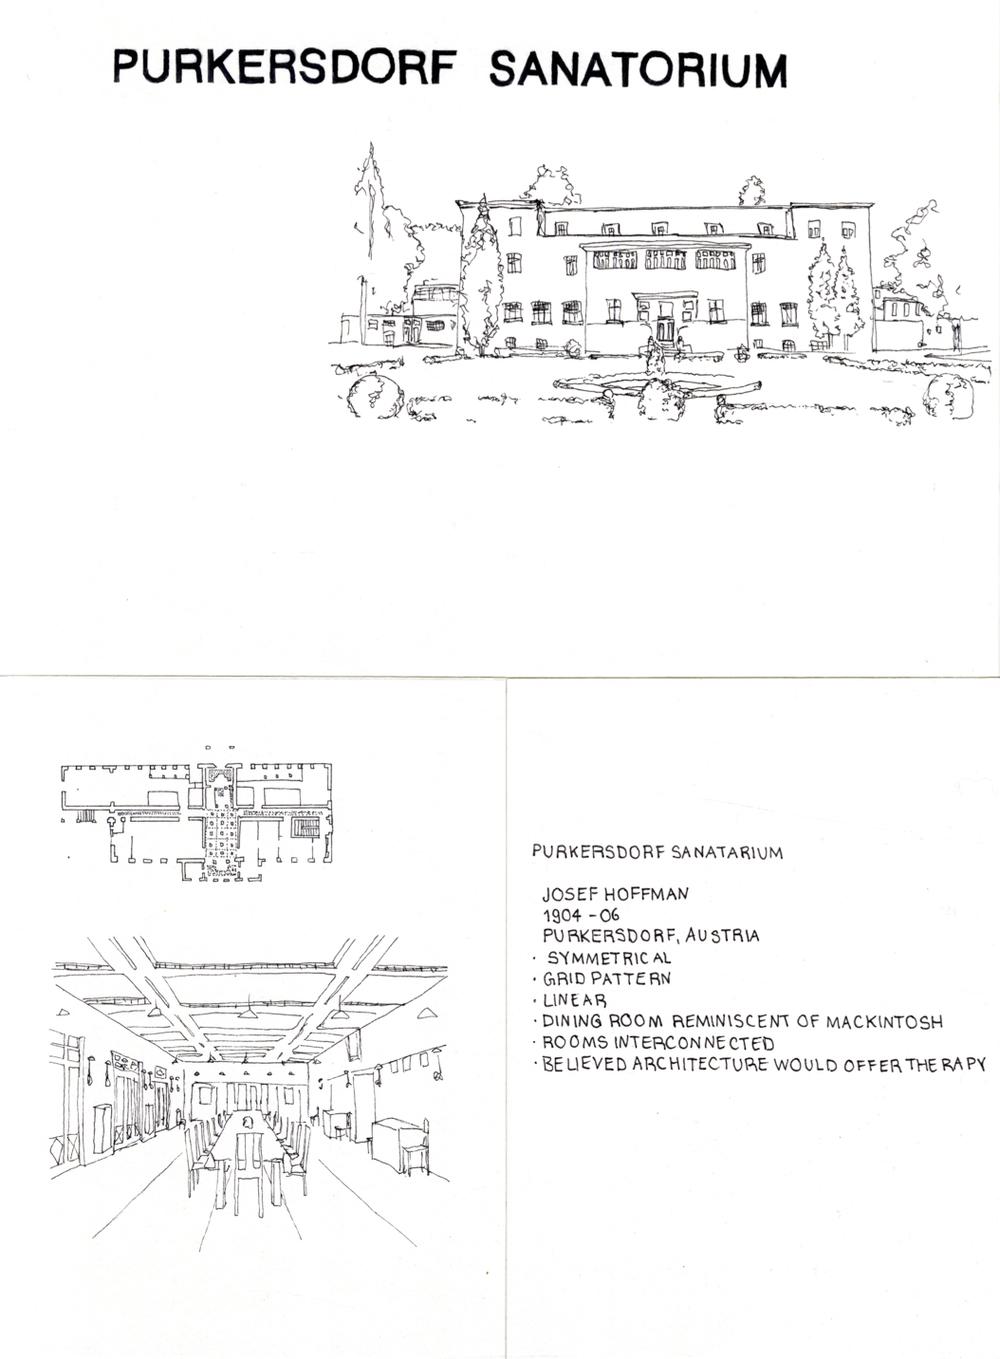 Puckersdorf Sanatarium copy.jpg